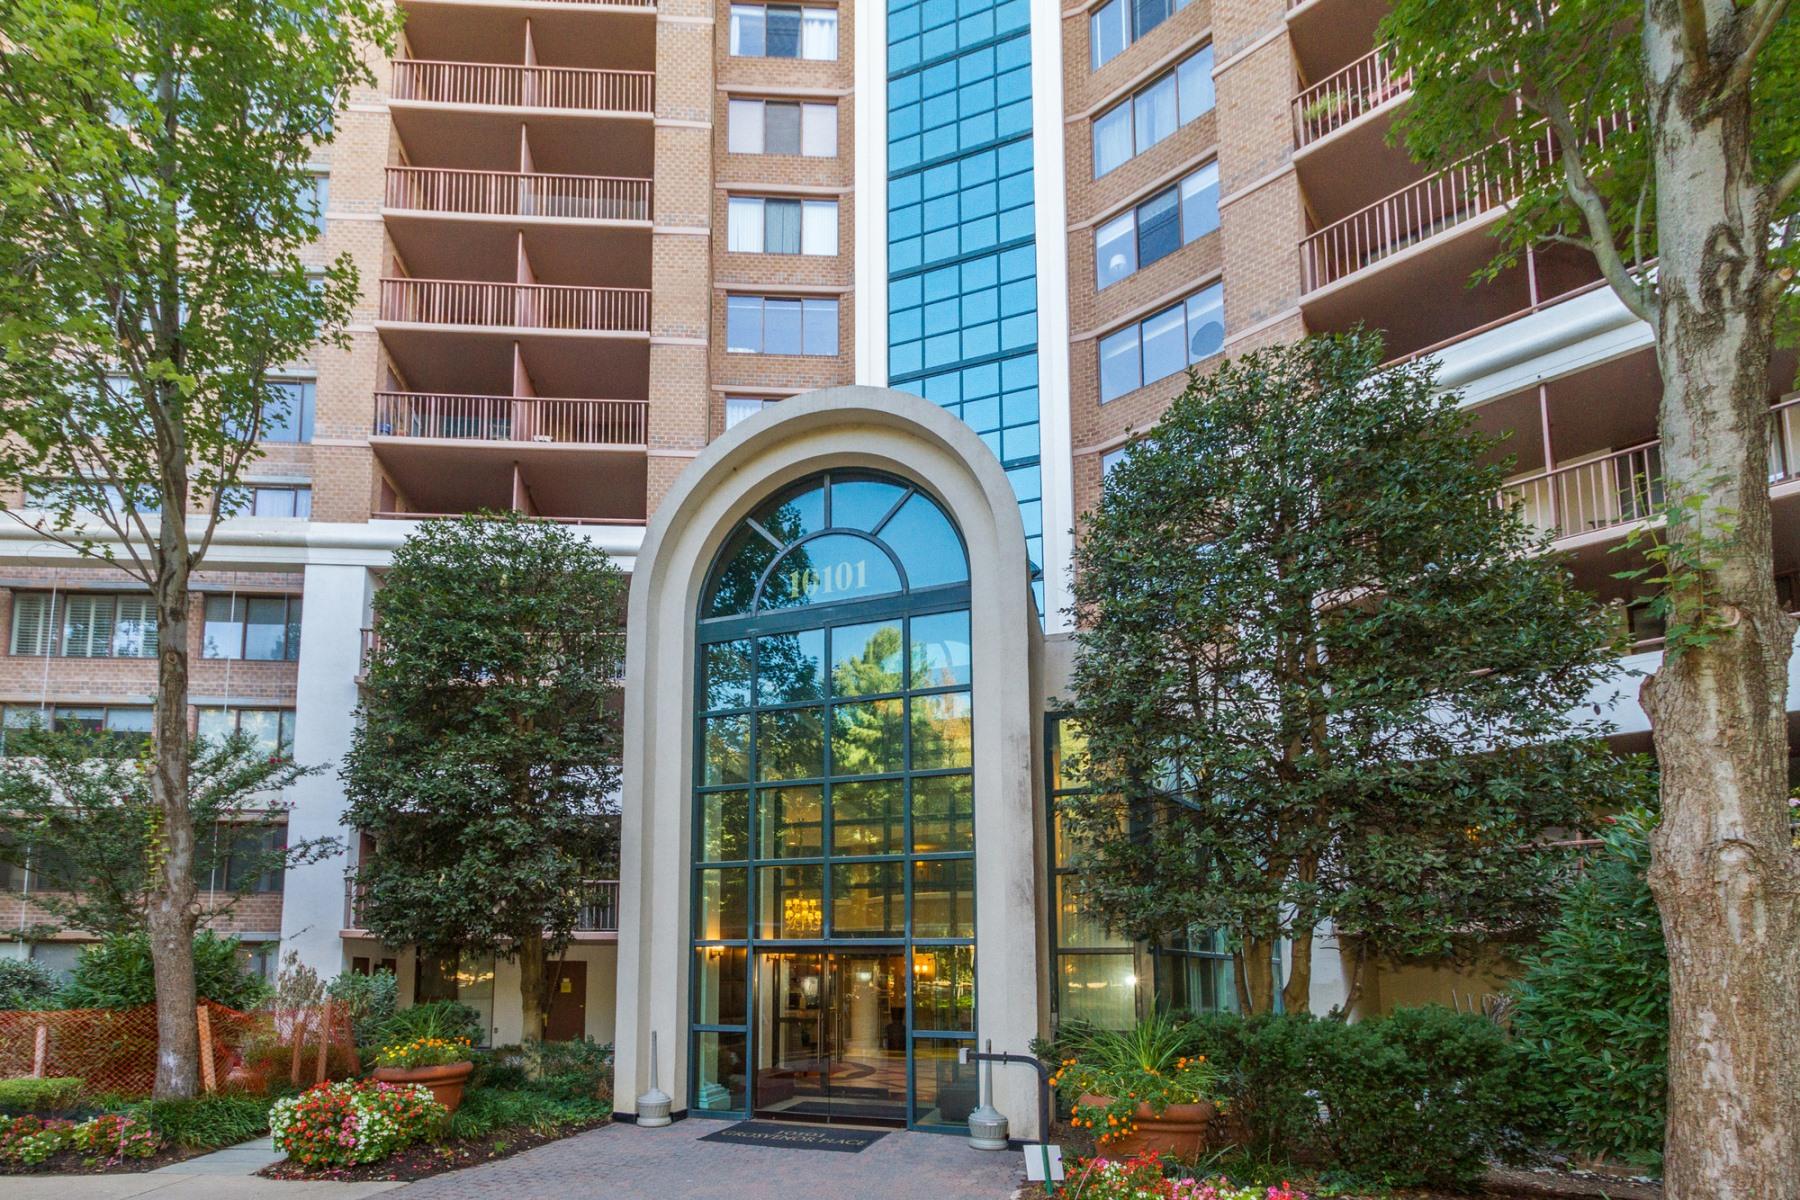 Condominium for Sale at 10101 Grosvenor Place 1319, Rockville 10101 Grosvenor Pl 1319 Rockville, Maryland 20852 United States